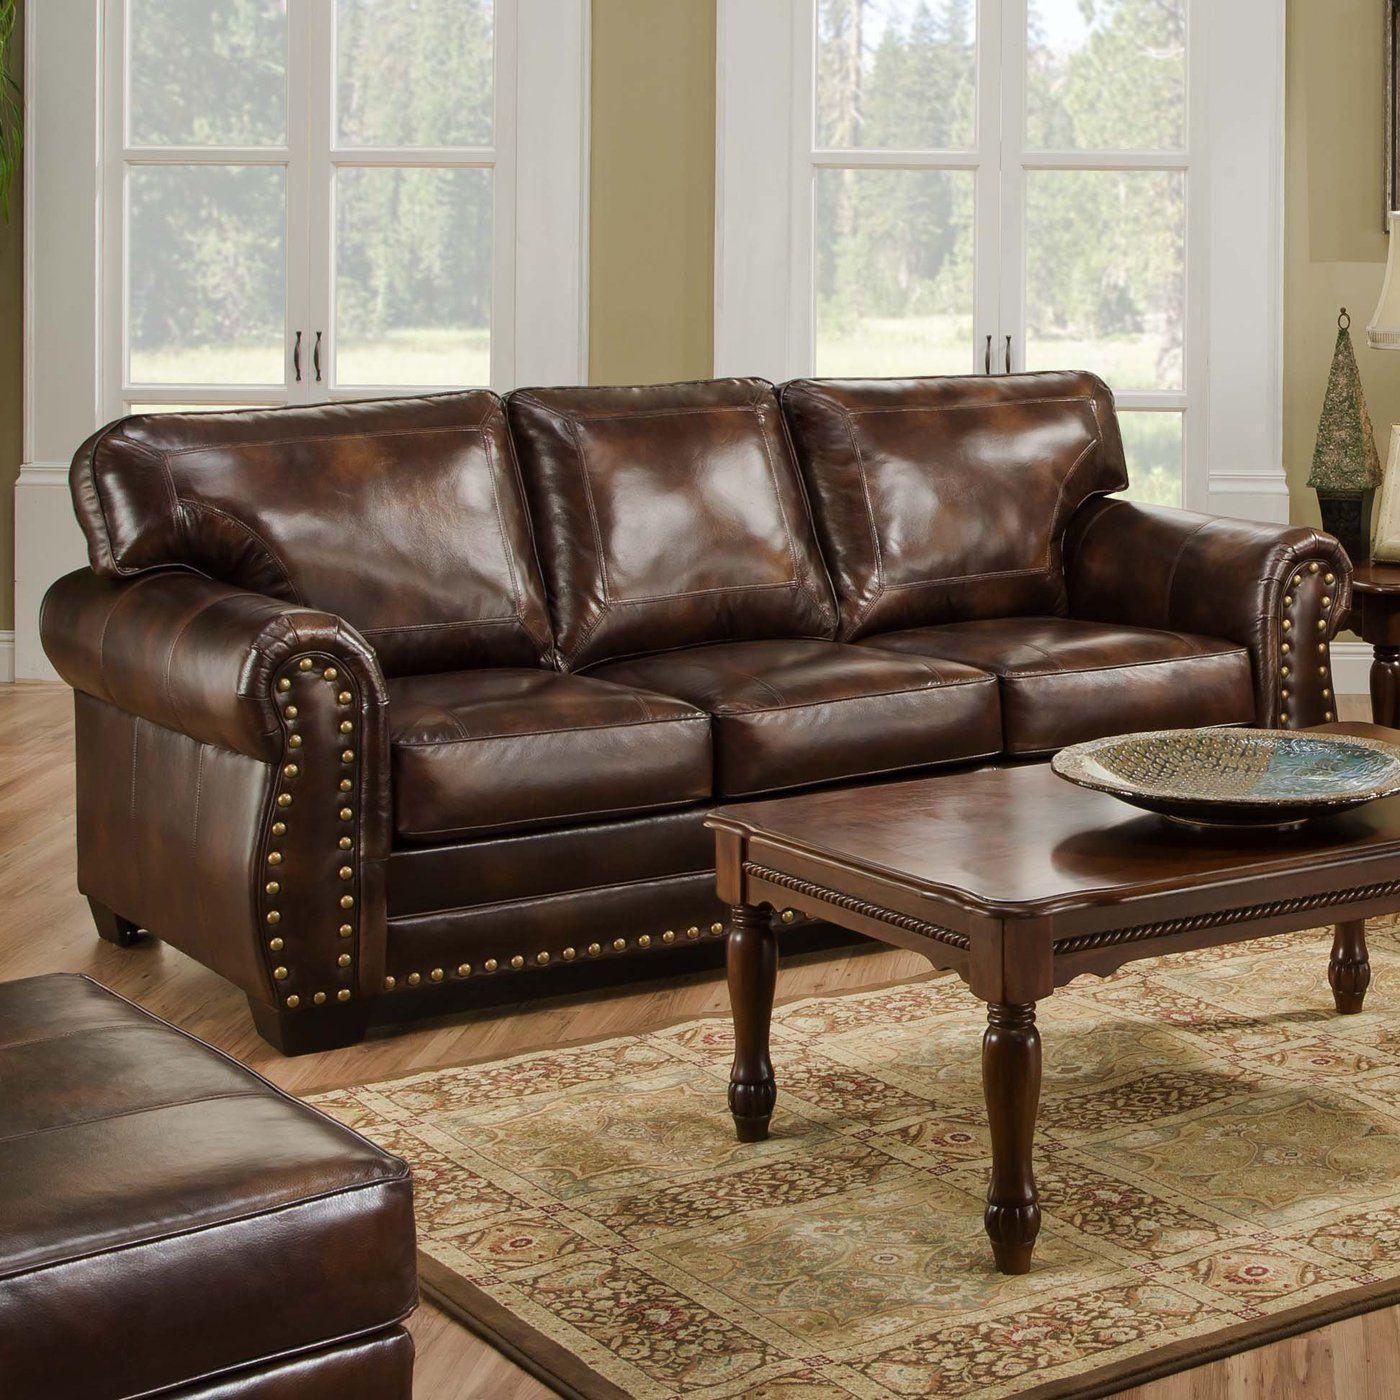 leather sleeper sofa (queen size) w/ nailhead trim